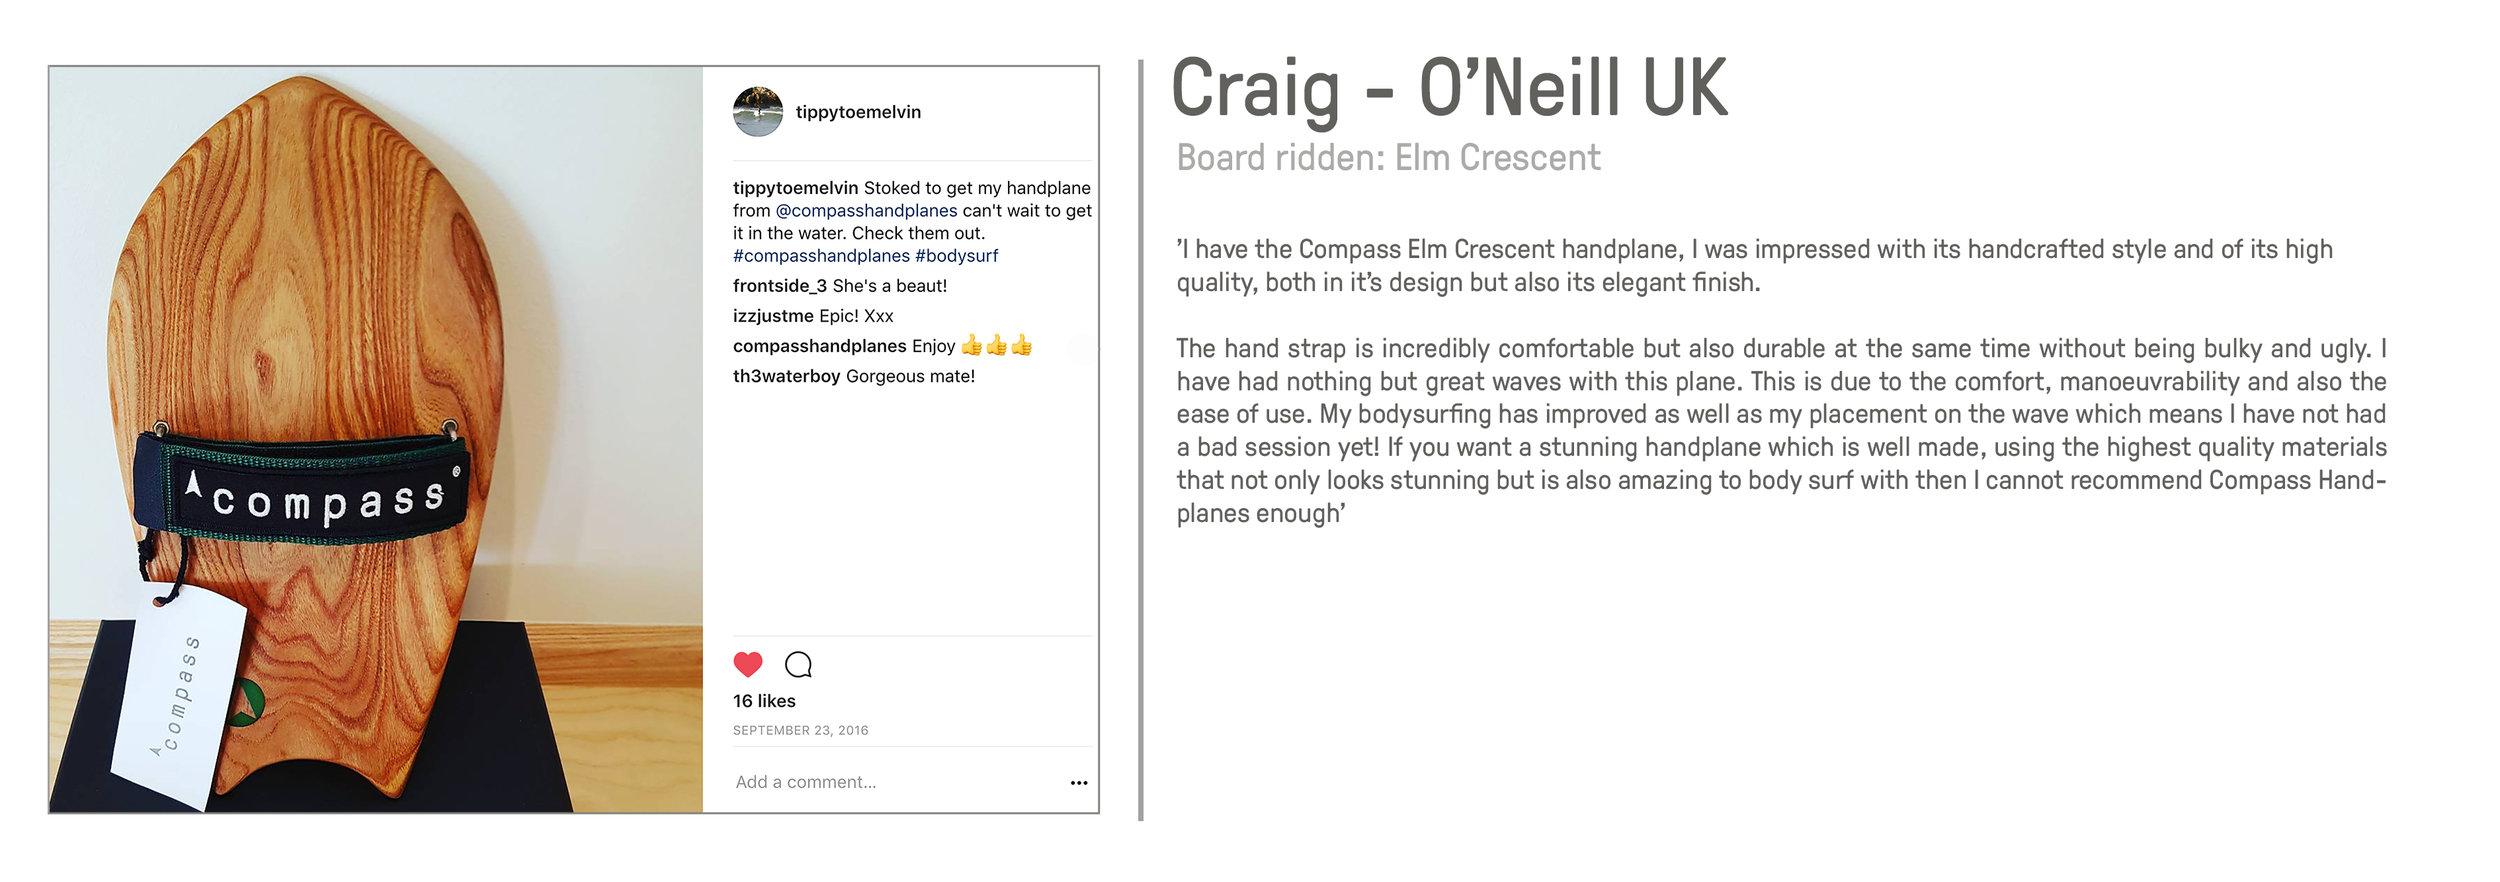 Craig O'Neill Compass Handplanes bodysurfing great review reviews